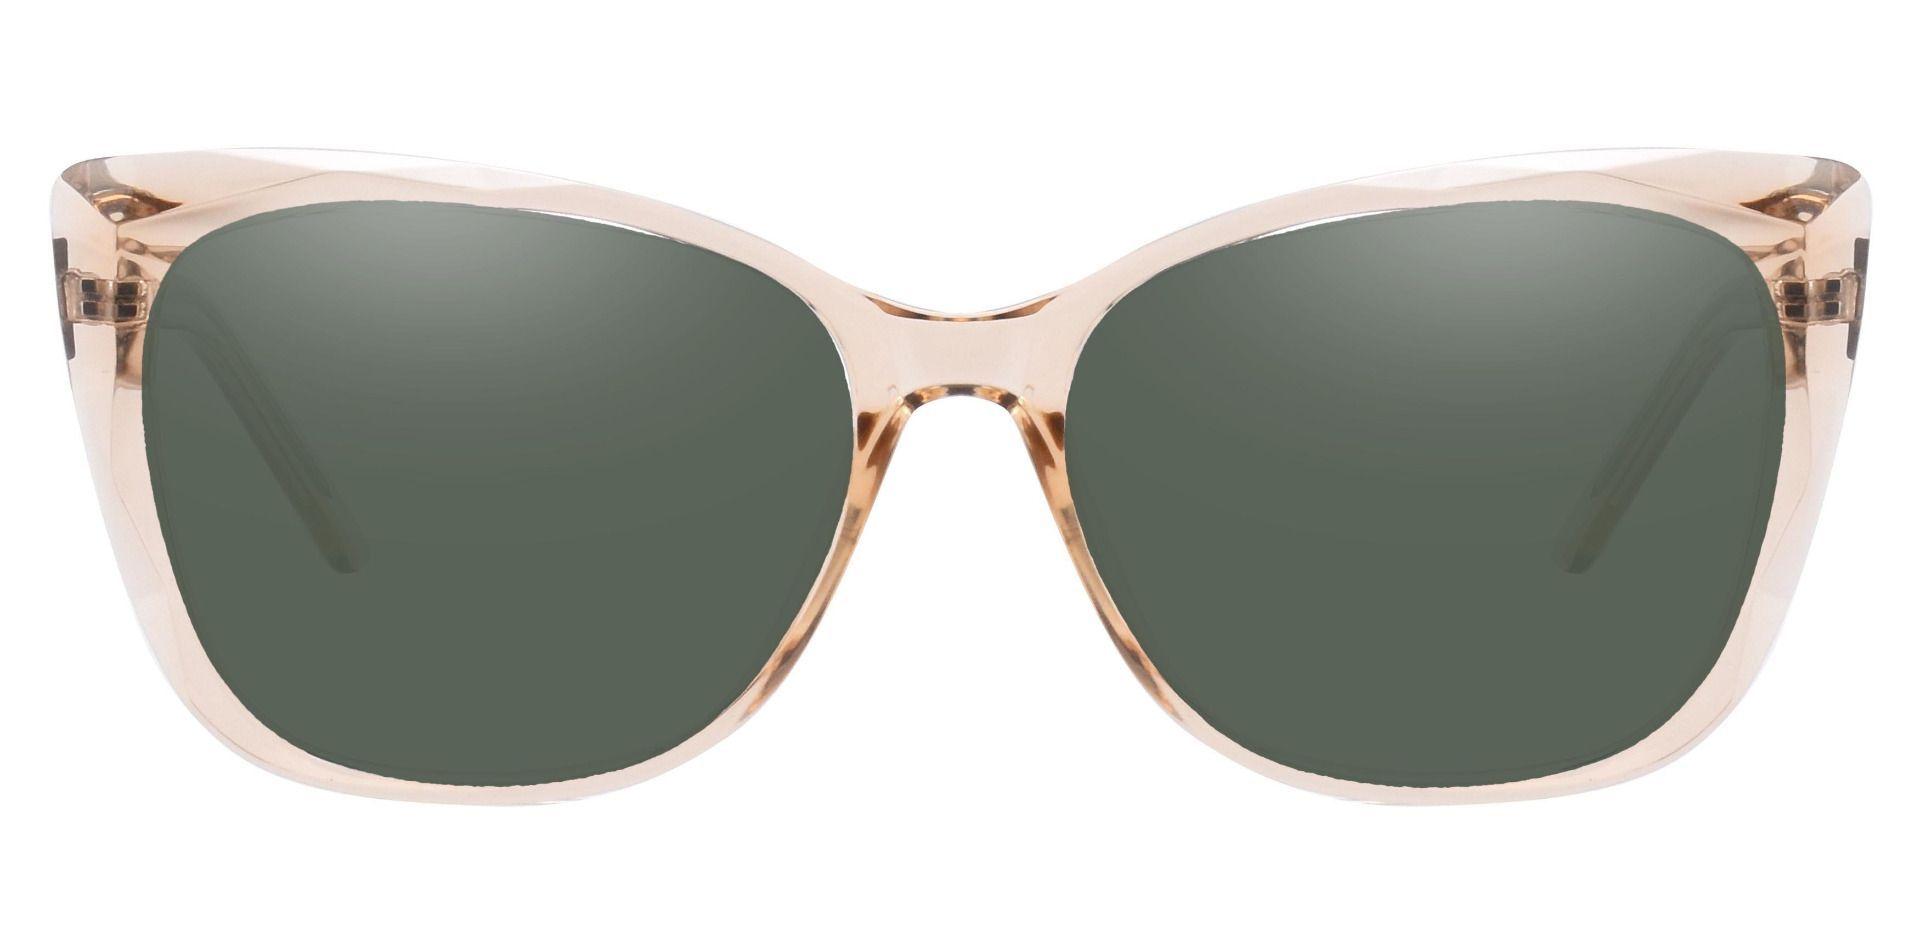 Mabel Square Progressive Sunglasses - Brown Frame With Green Lenses